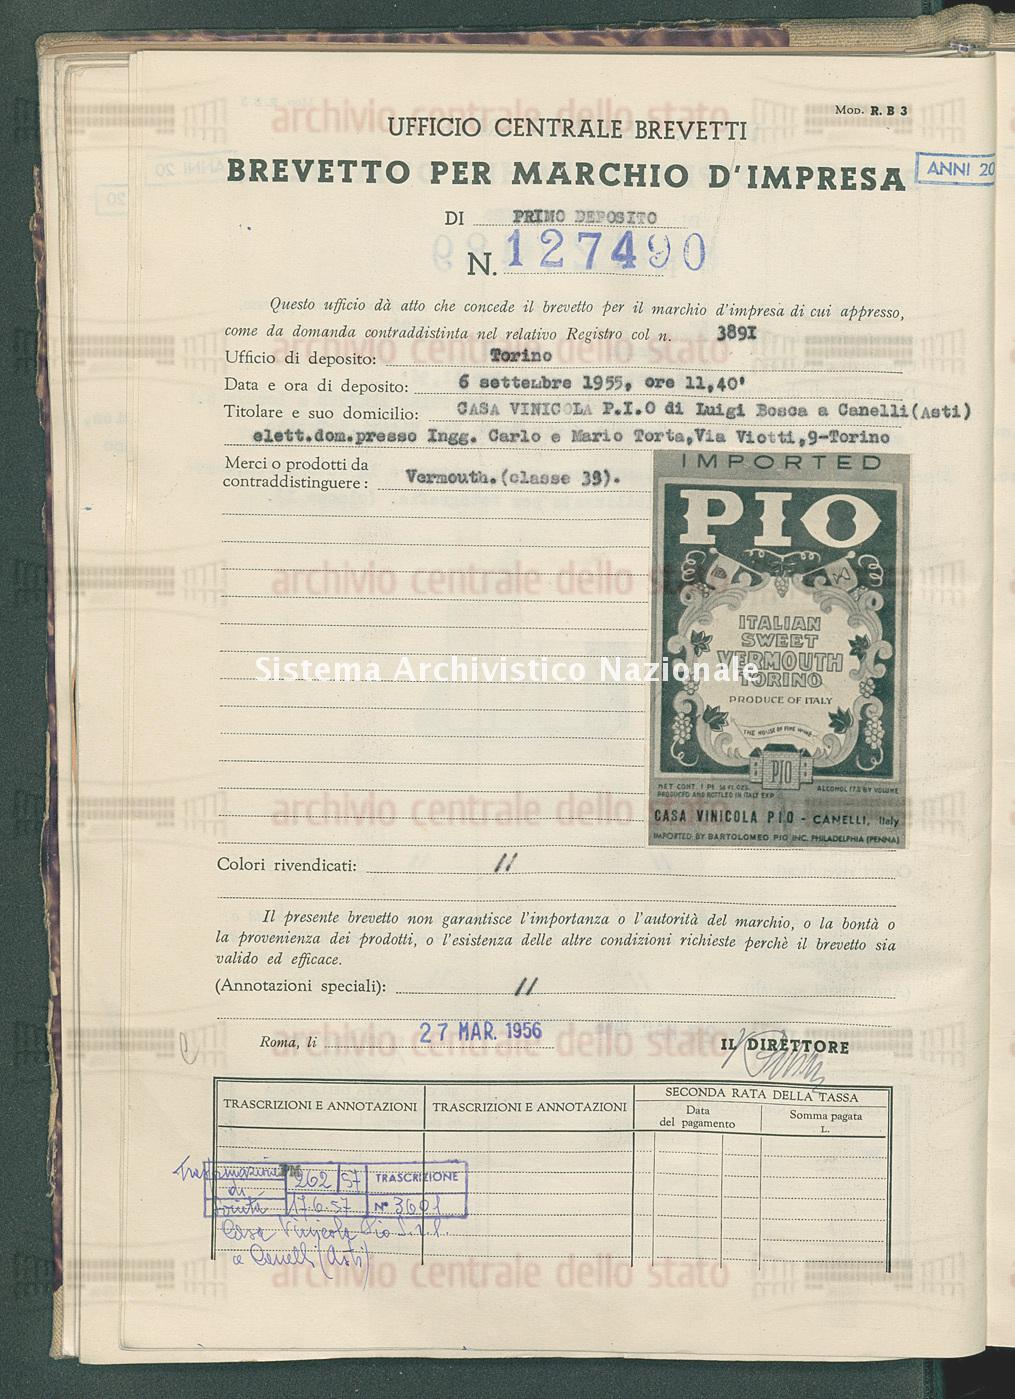 Casa Vinicola P.I.O. Di Luigi Bosca (27/03/1956)